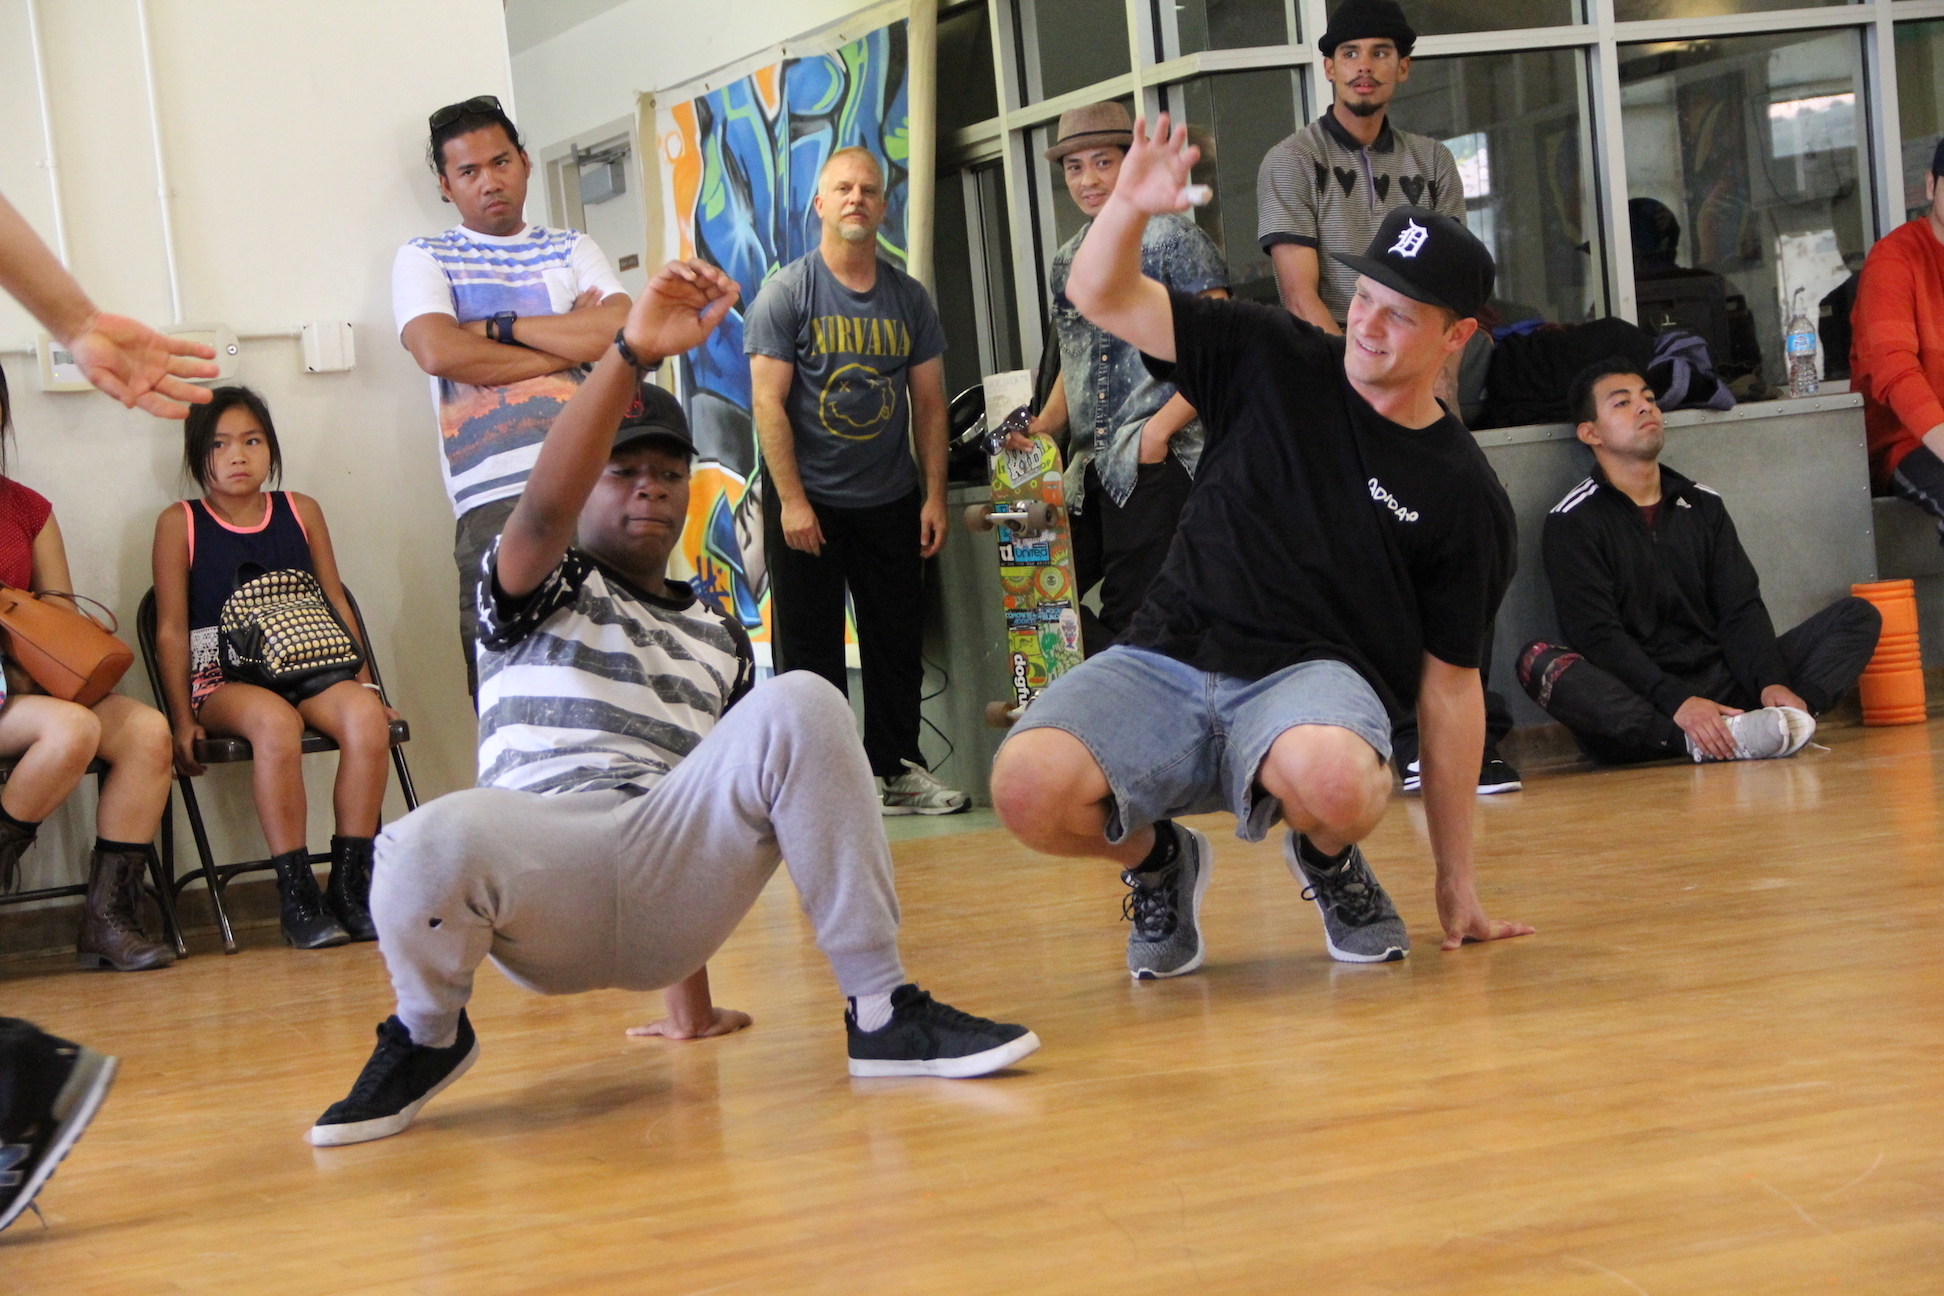 JUiCE Los Angeles Hip Hop Nonprofit Breakdance Music Art Community Youth Breakdance Los Angeles Bboy Learn.JPG